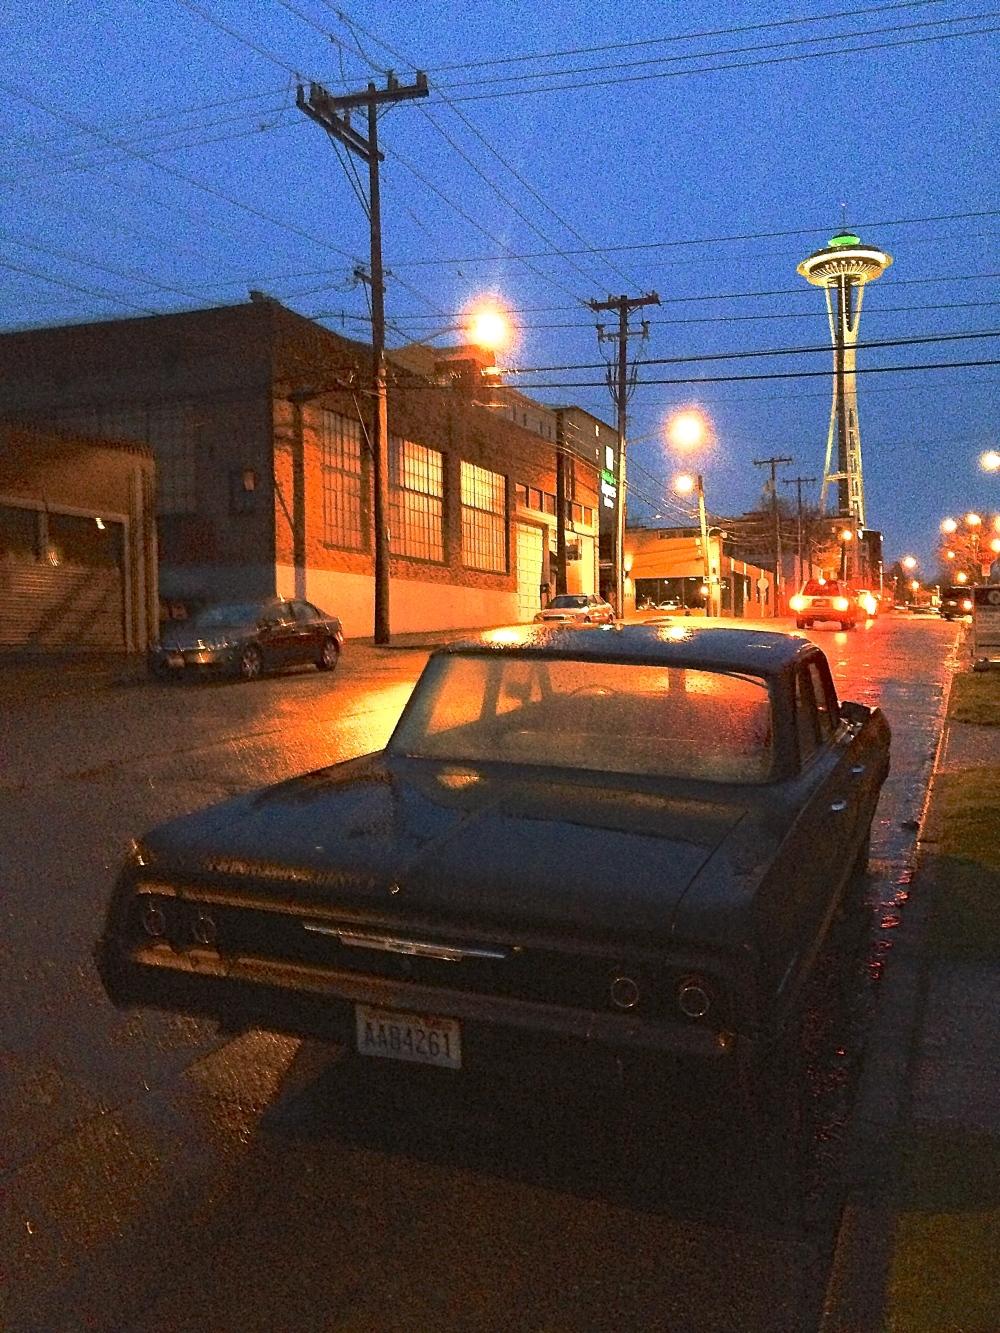 Chevrolet Bel Air at dusk